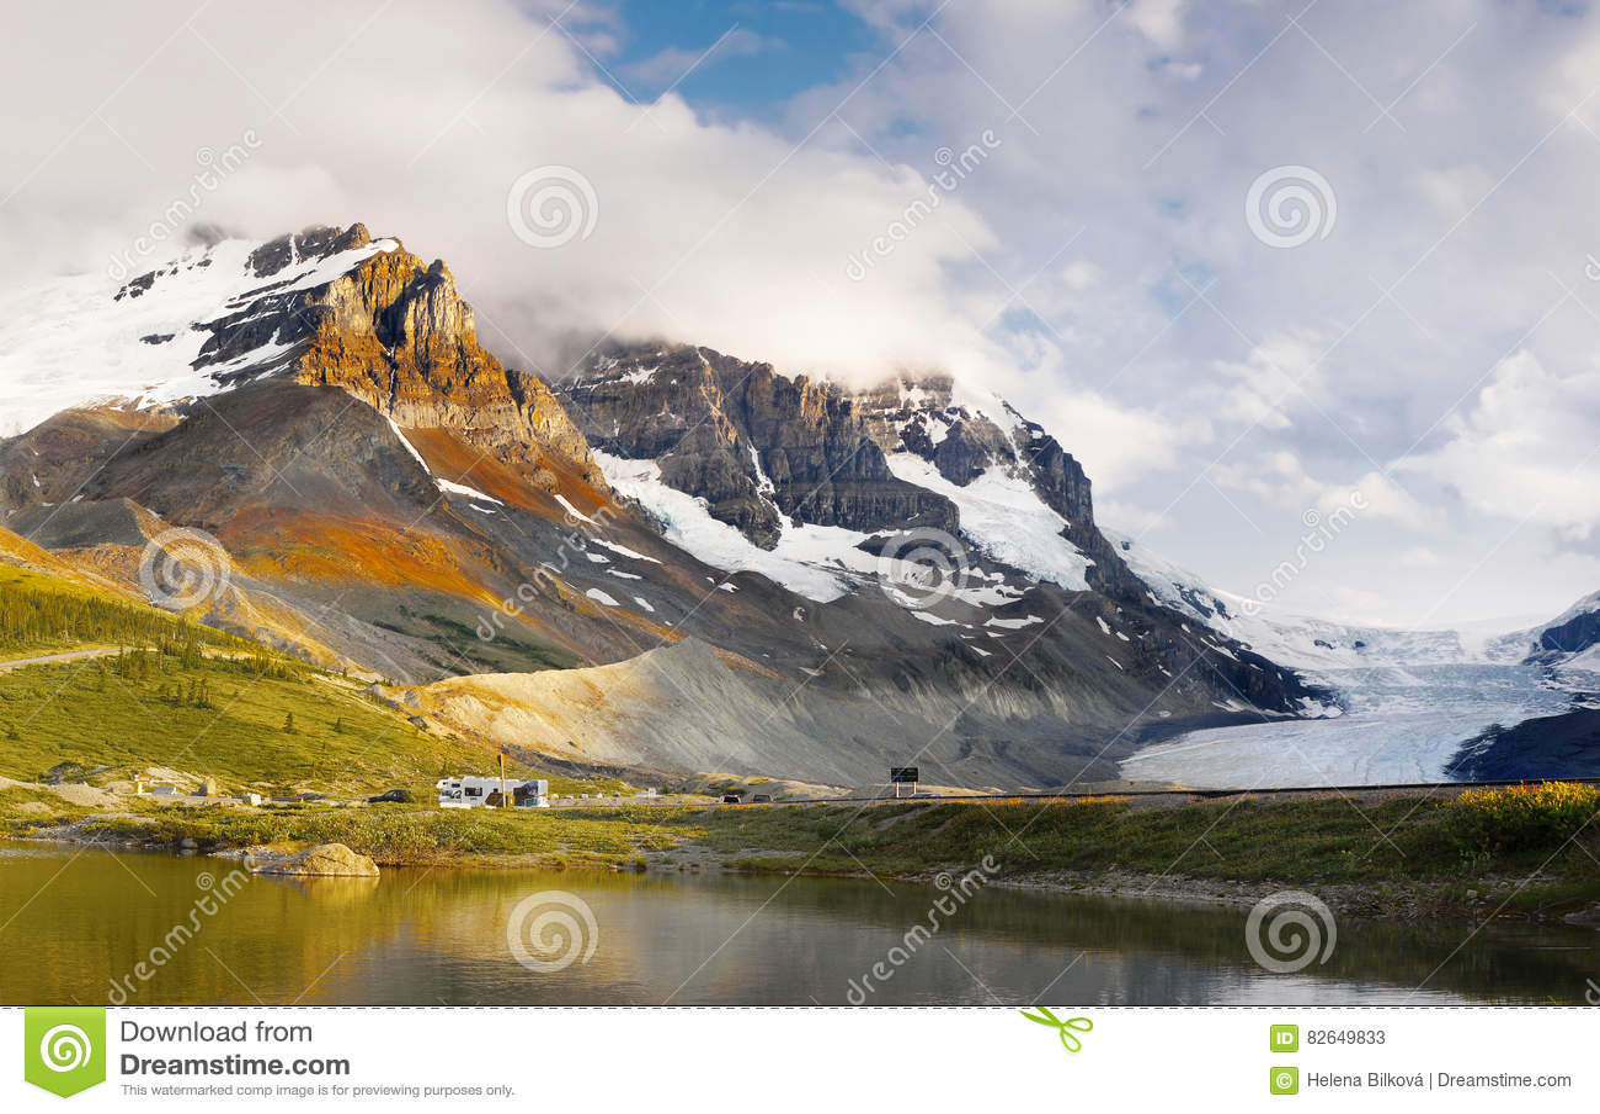 Ландшафт горной цепи, скалистые горы, Канада